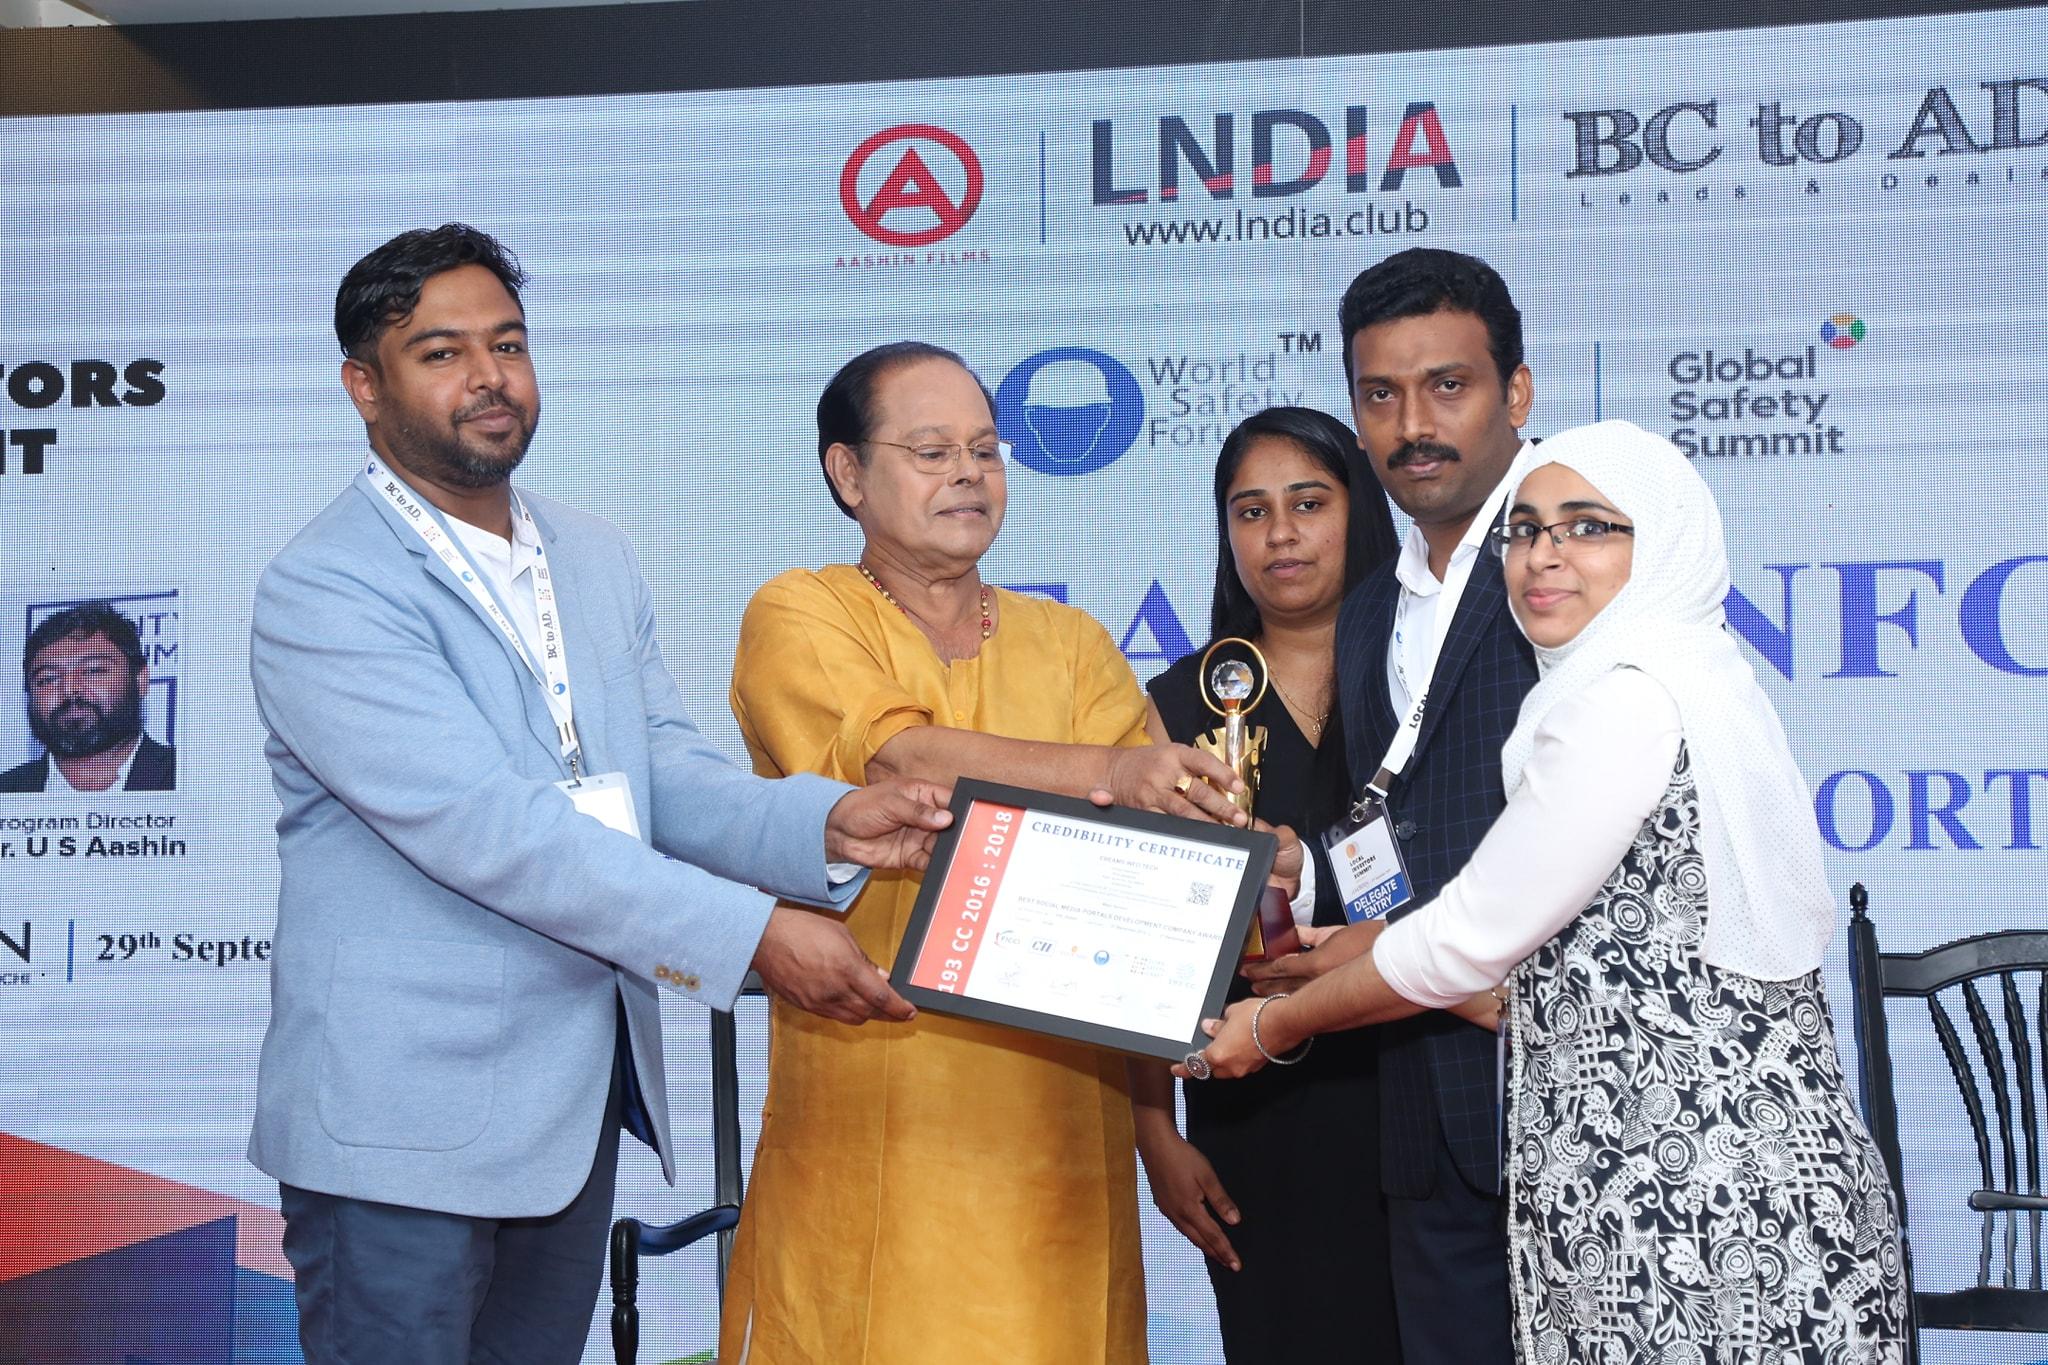 eBeams Directors NasemKhan and Raseena are Receiving Award from Actor Innocent